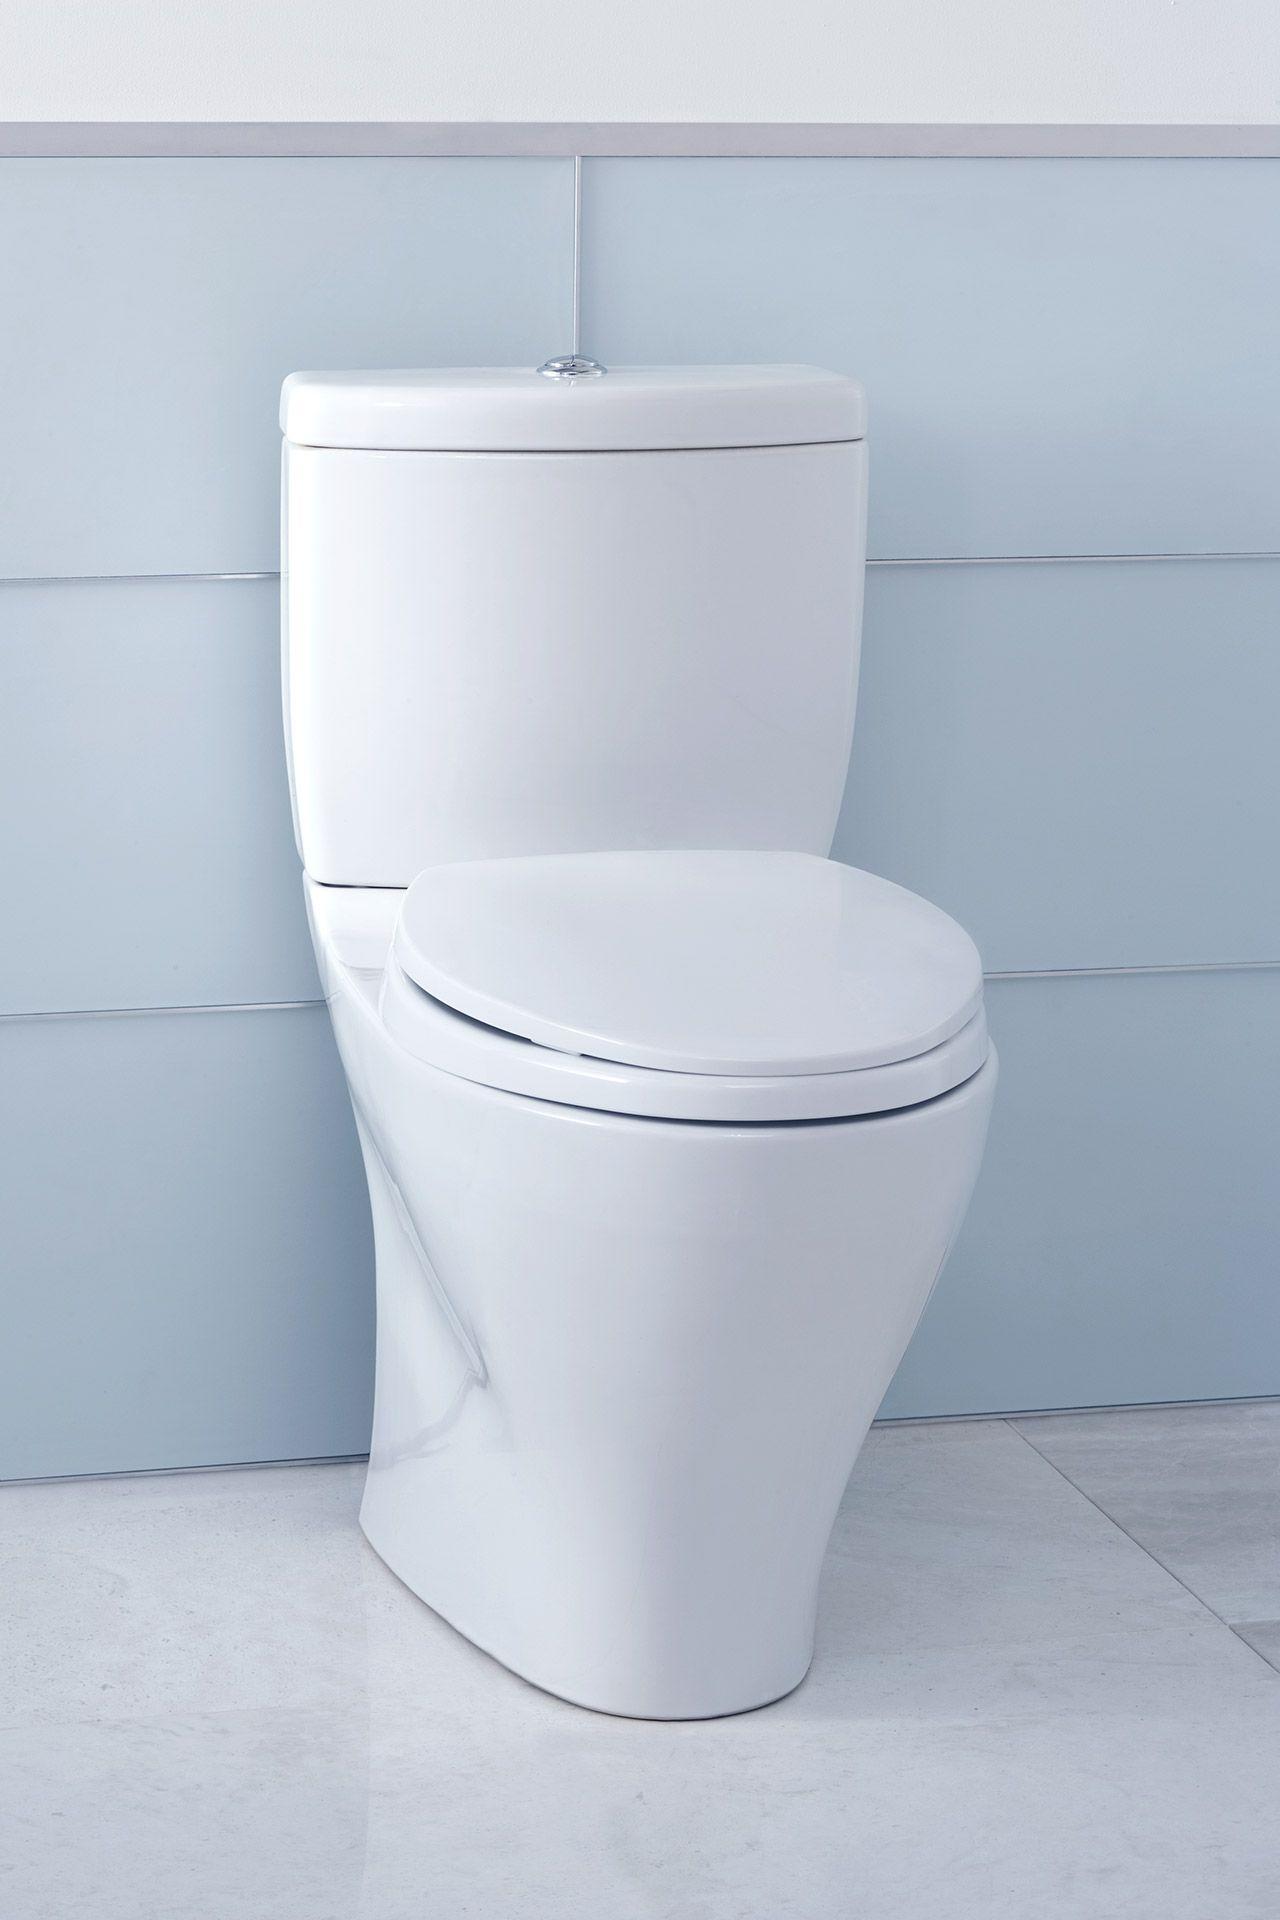 Aquia Ii Dual Flush Two Piece Toilet 1 6 Gpf Amp 0 9 Gpf